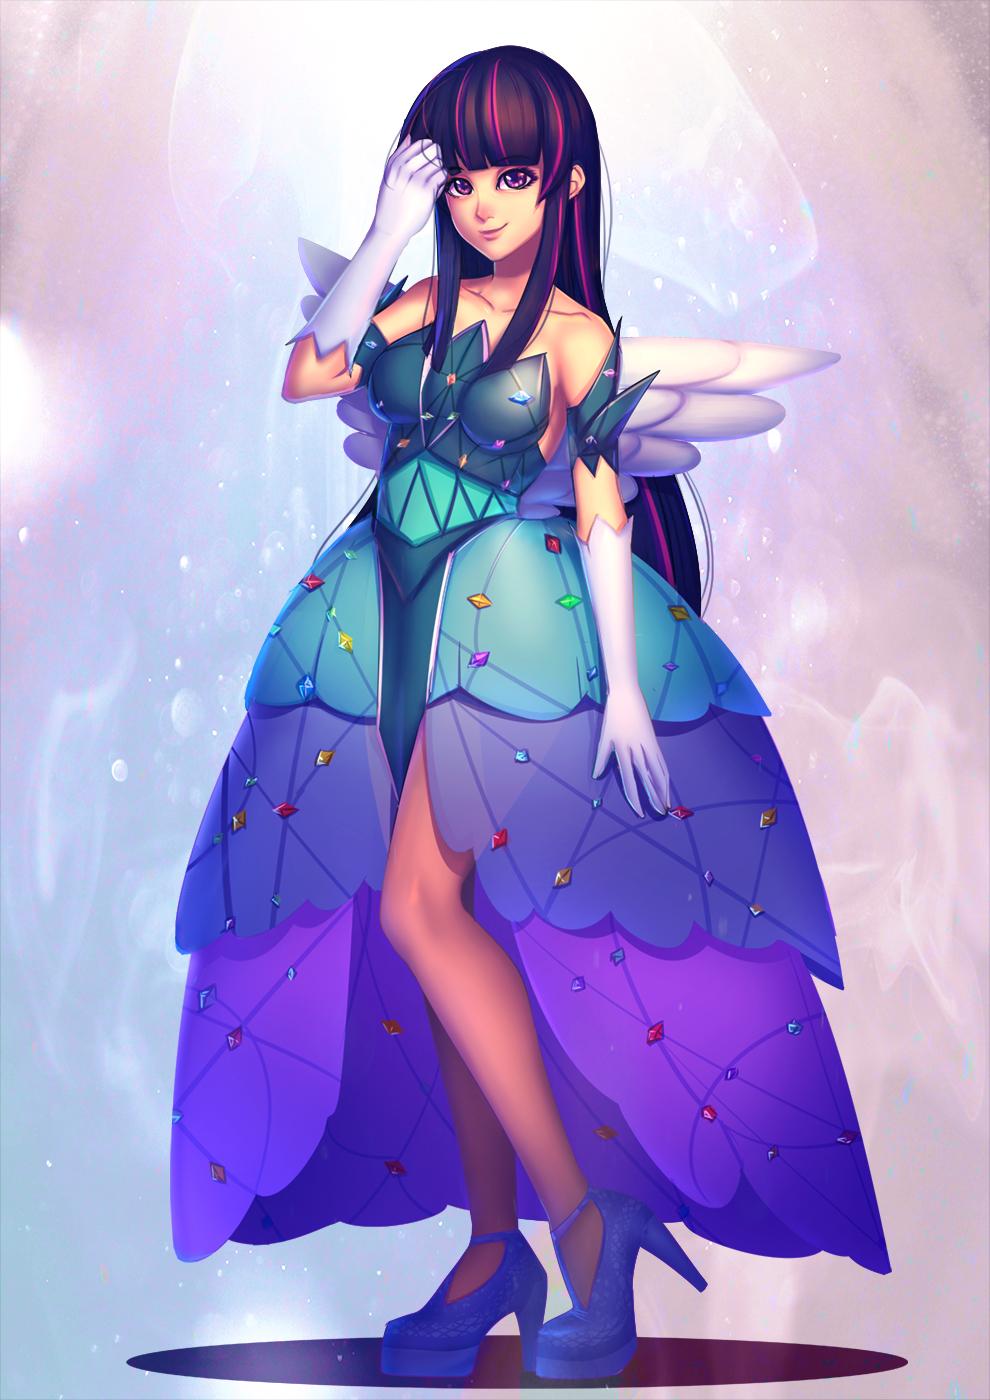 commission: Gijinka - Princess Dress